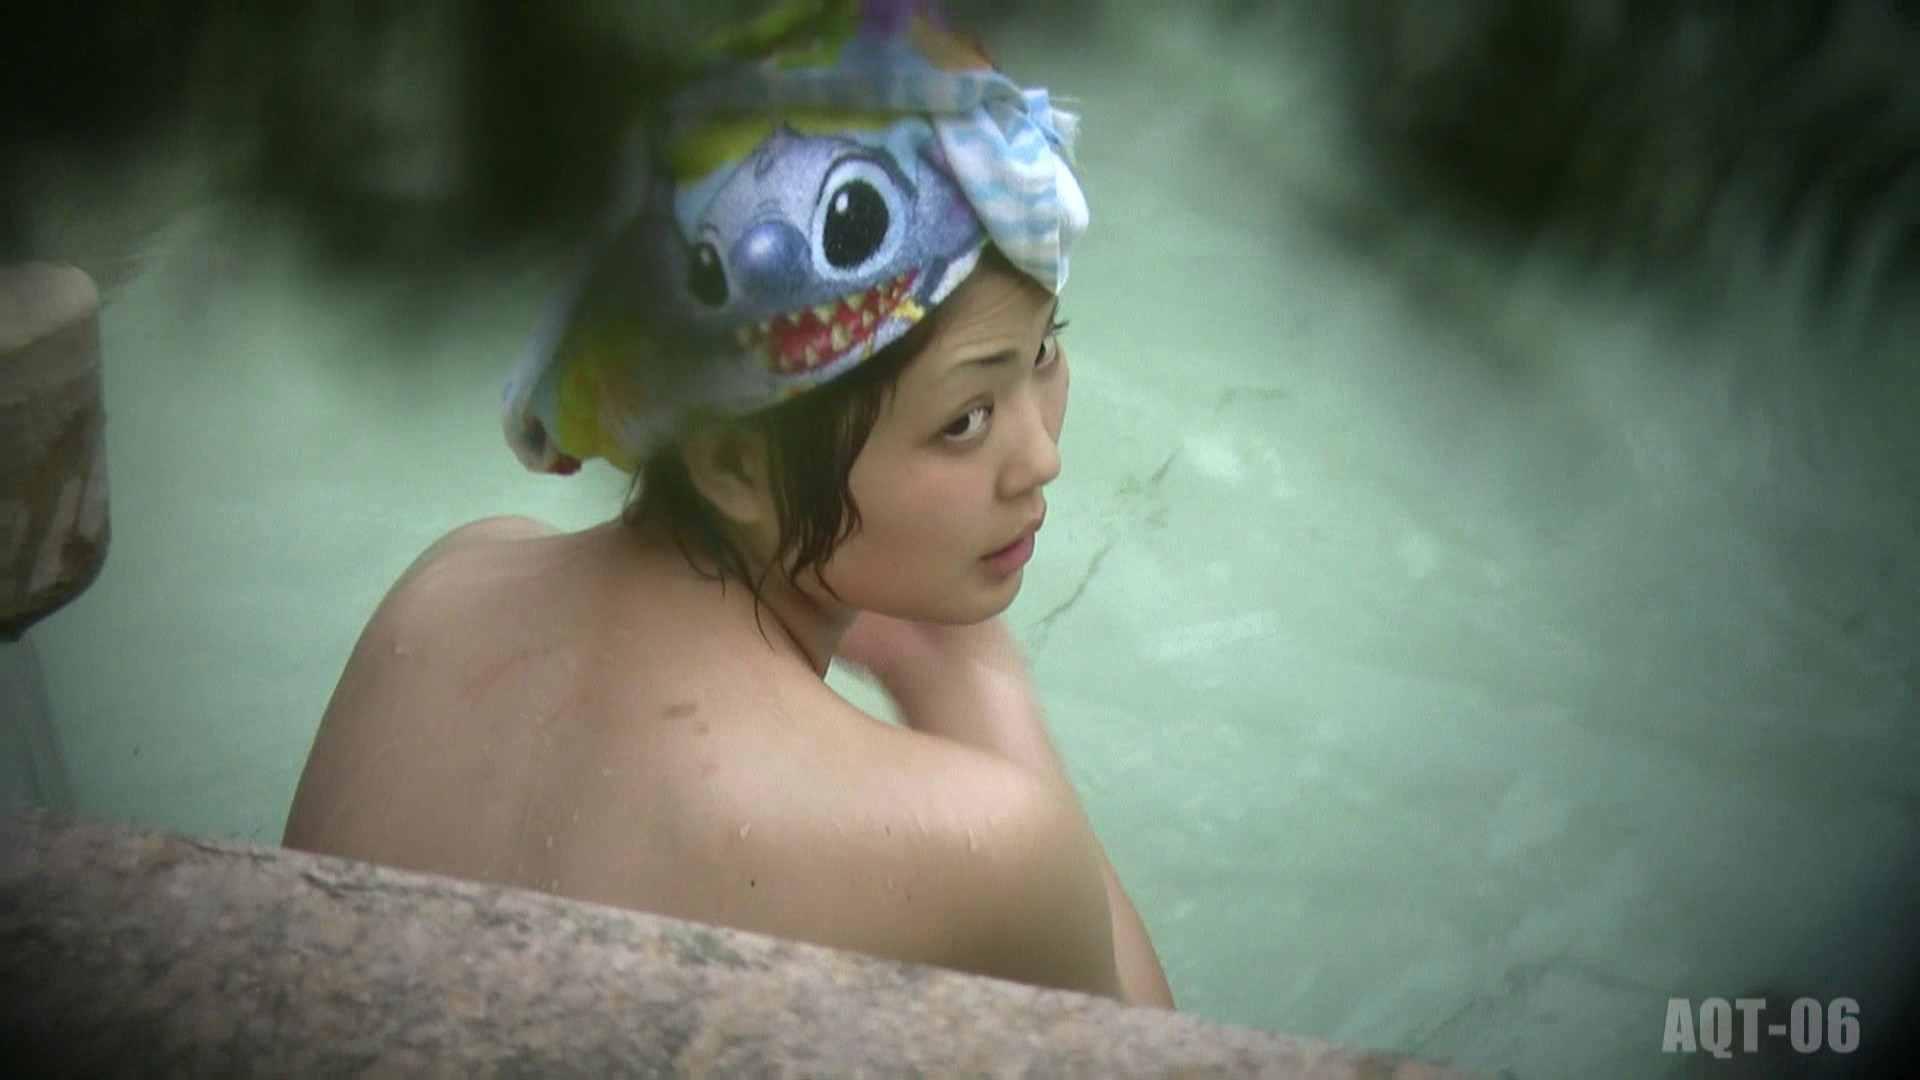 Aquaな露天風呂Vol.761 盗撮 エロ無料画像 74枚 68